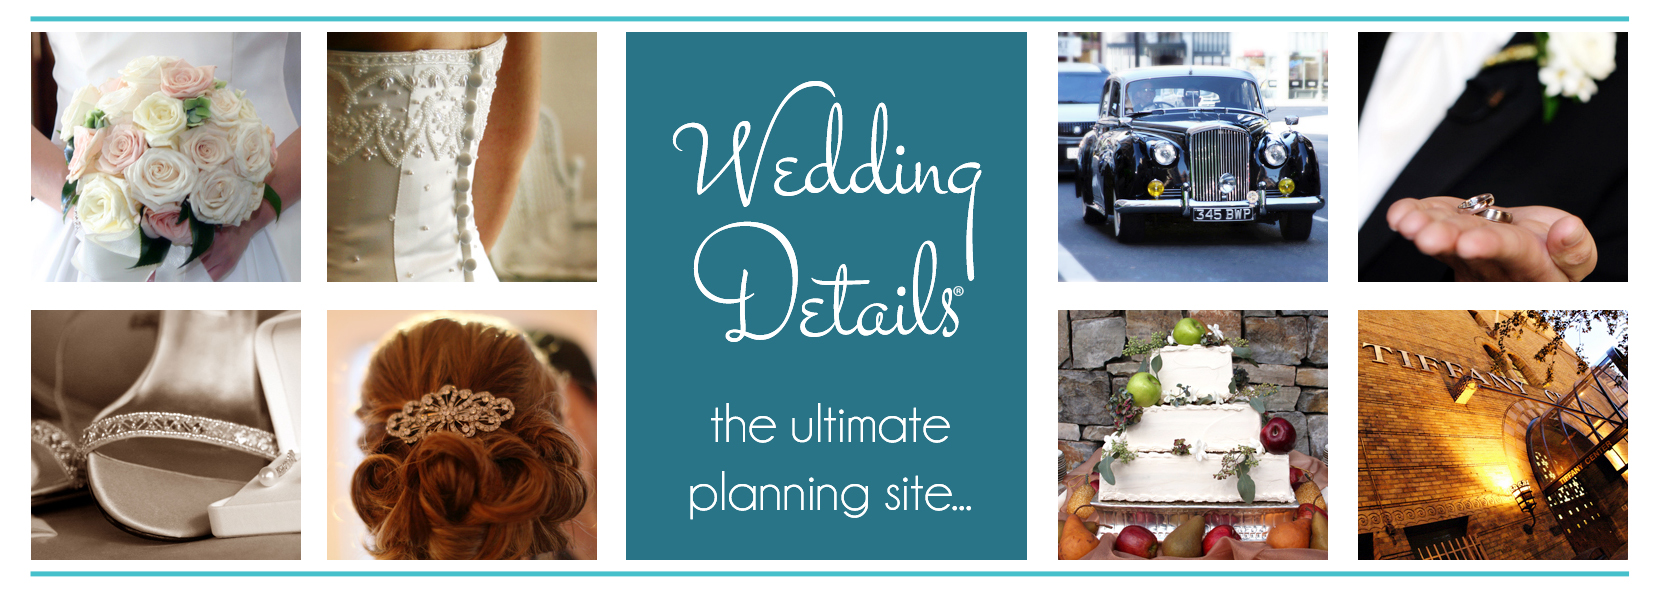 Wedding Details Final R